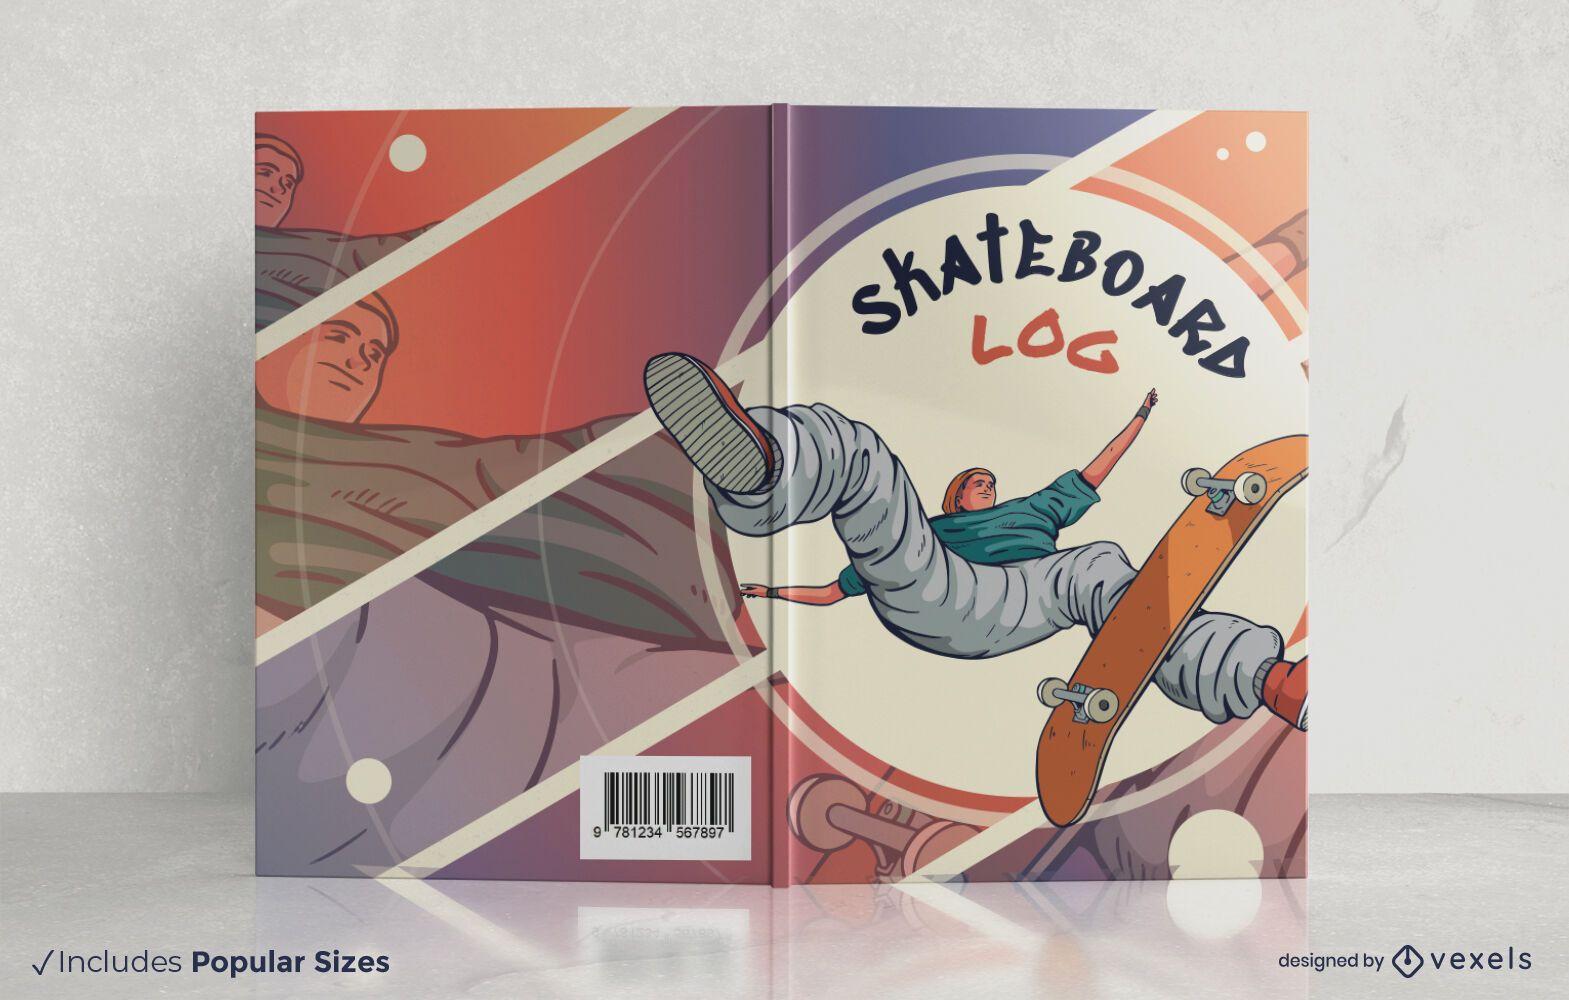 Skateboard log book cover design